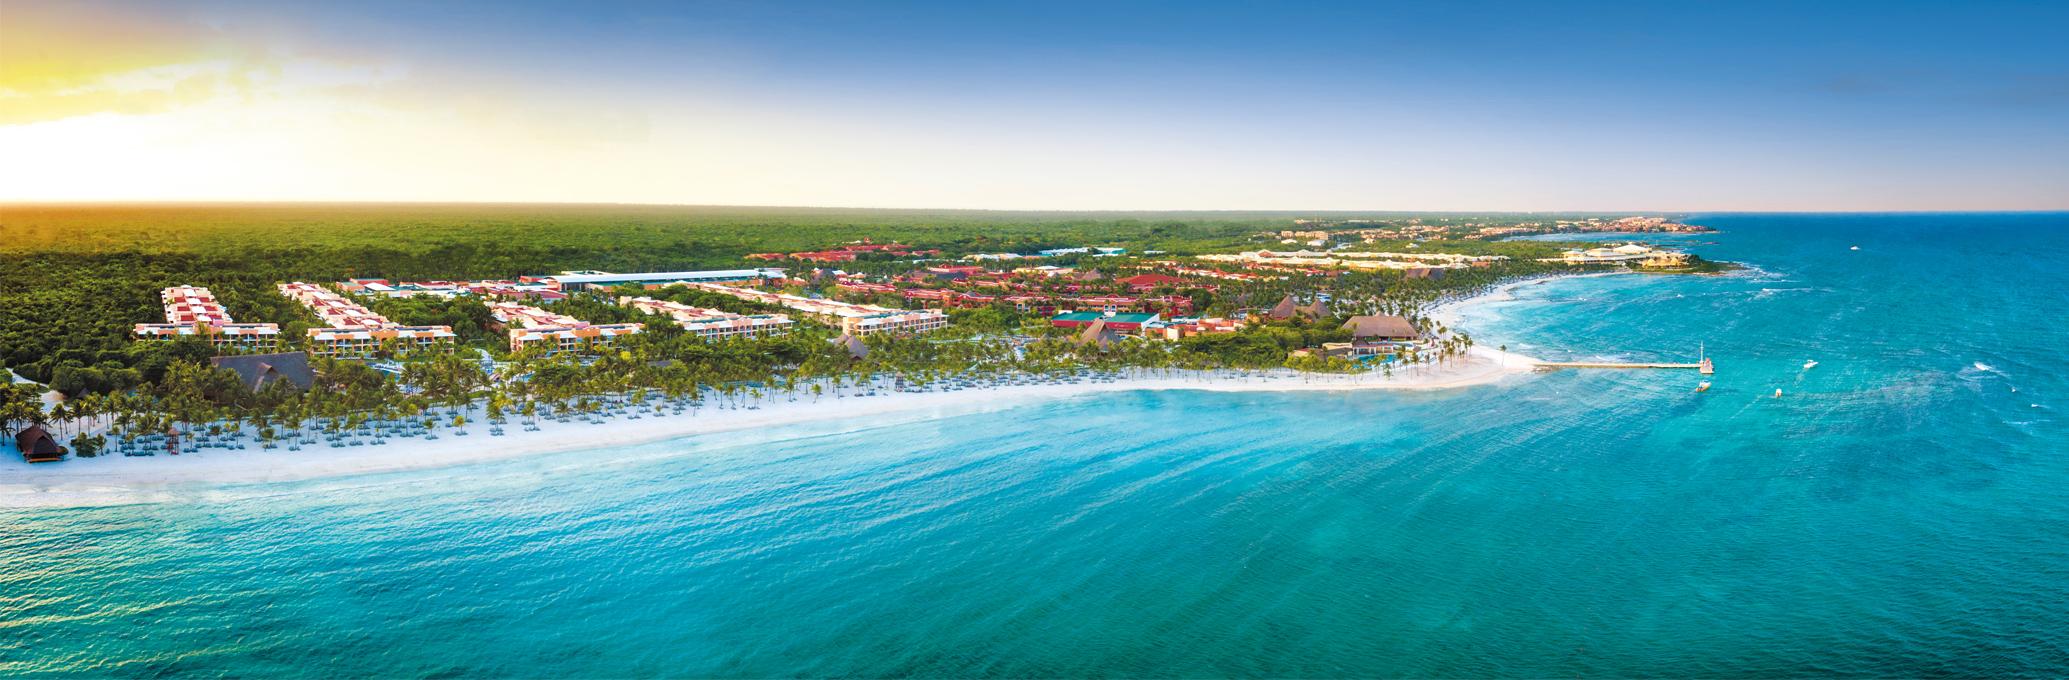 Barceló Maya Grand Resort: melhores hotéis em Riviera Maya